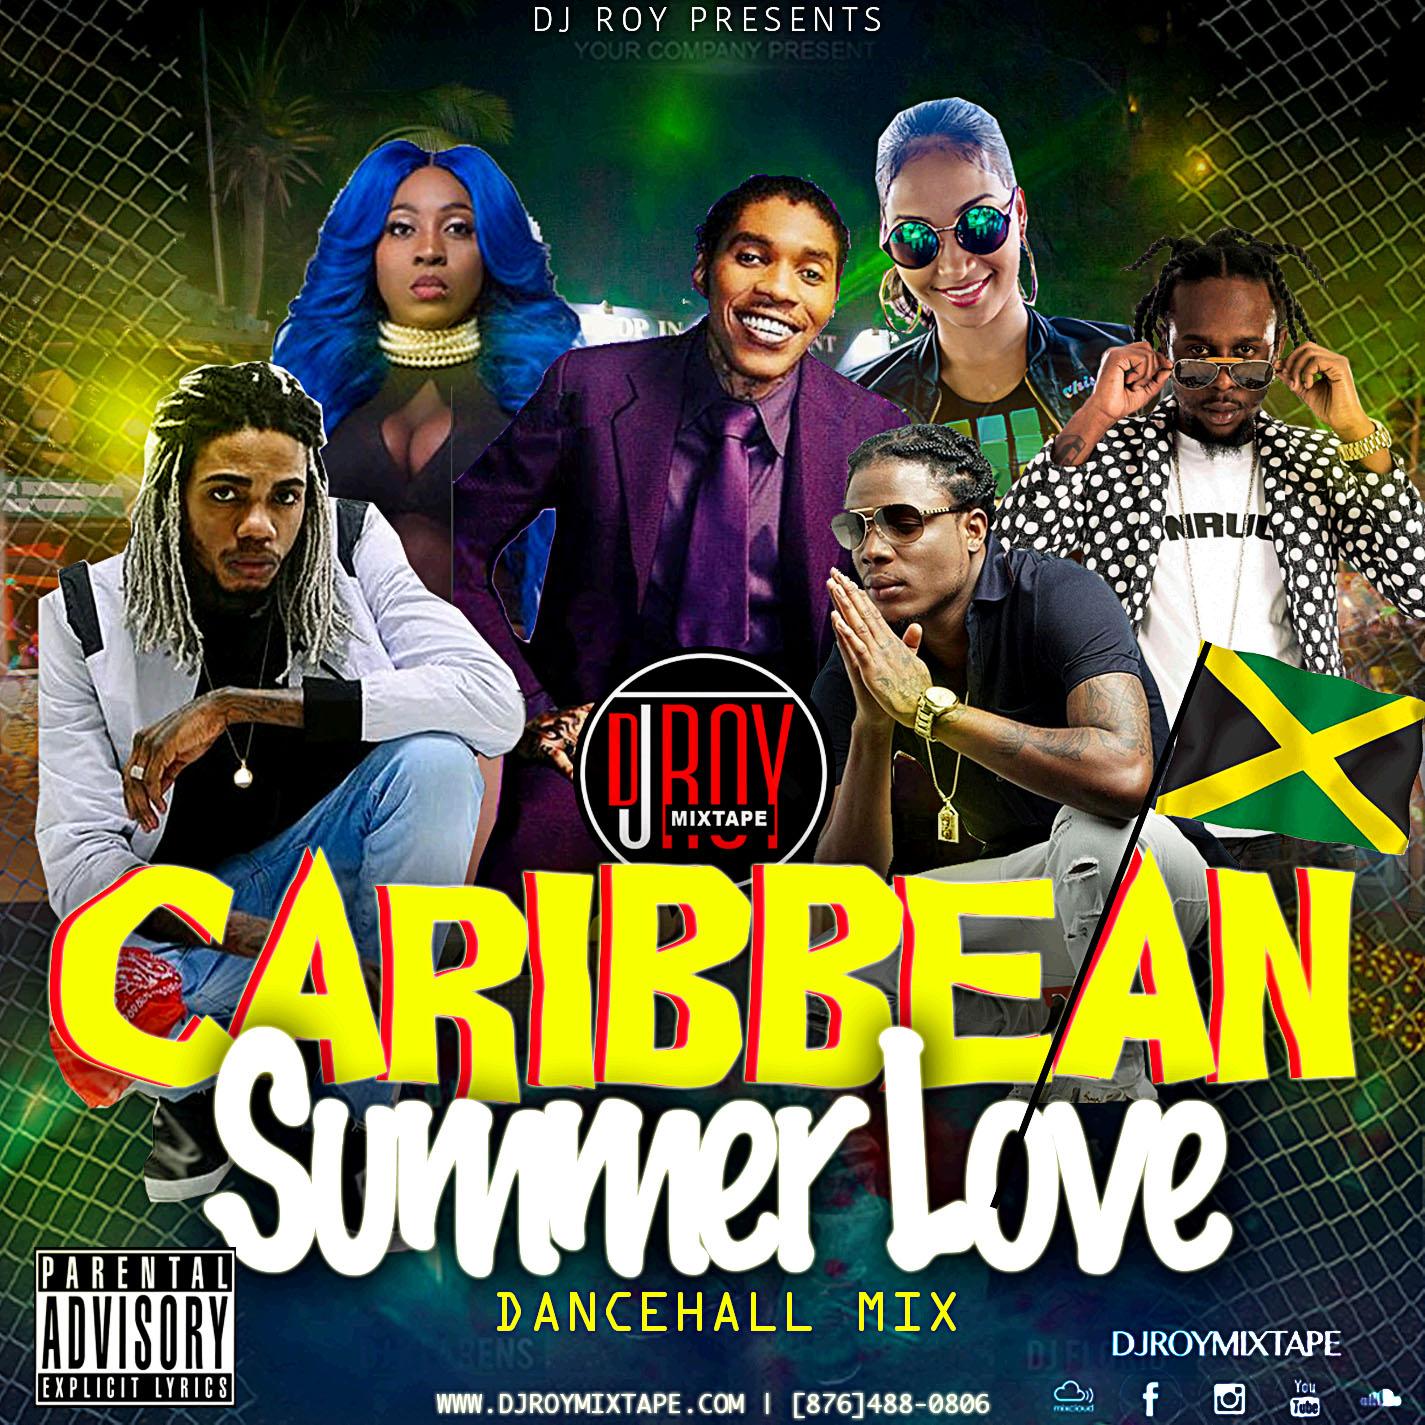 DJROYMIXTAPE : DJ ROY CARIBBEAN SUMMER LOVE DANCEHALL MIX